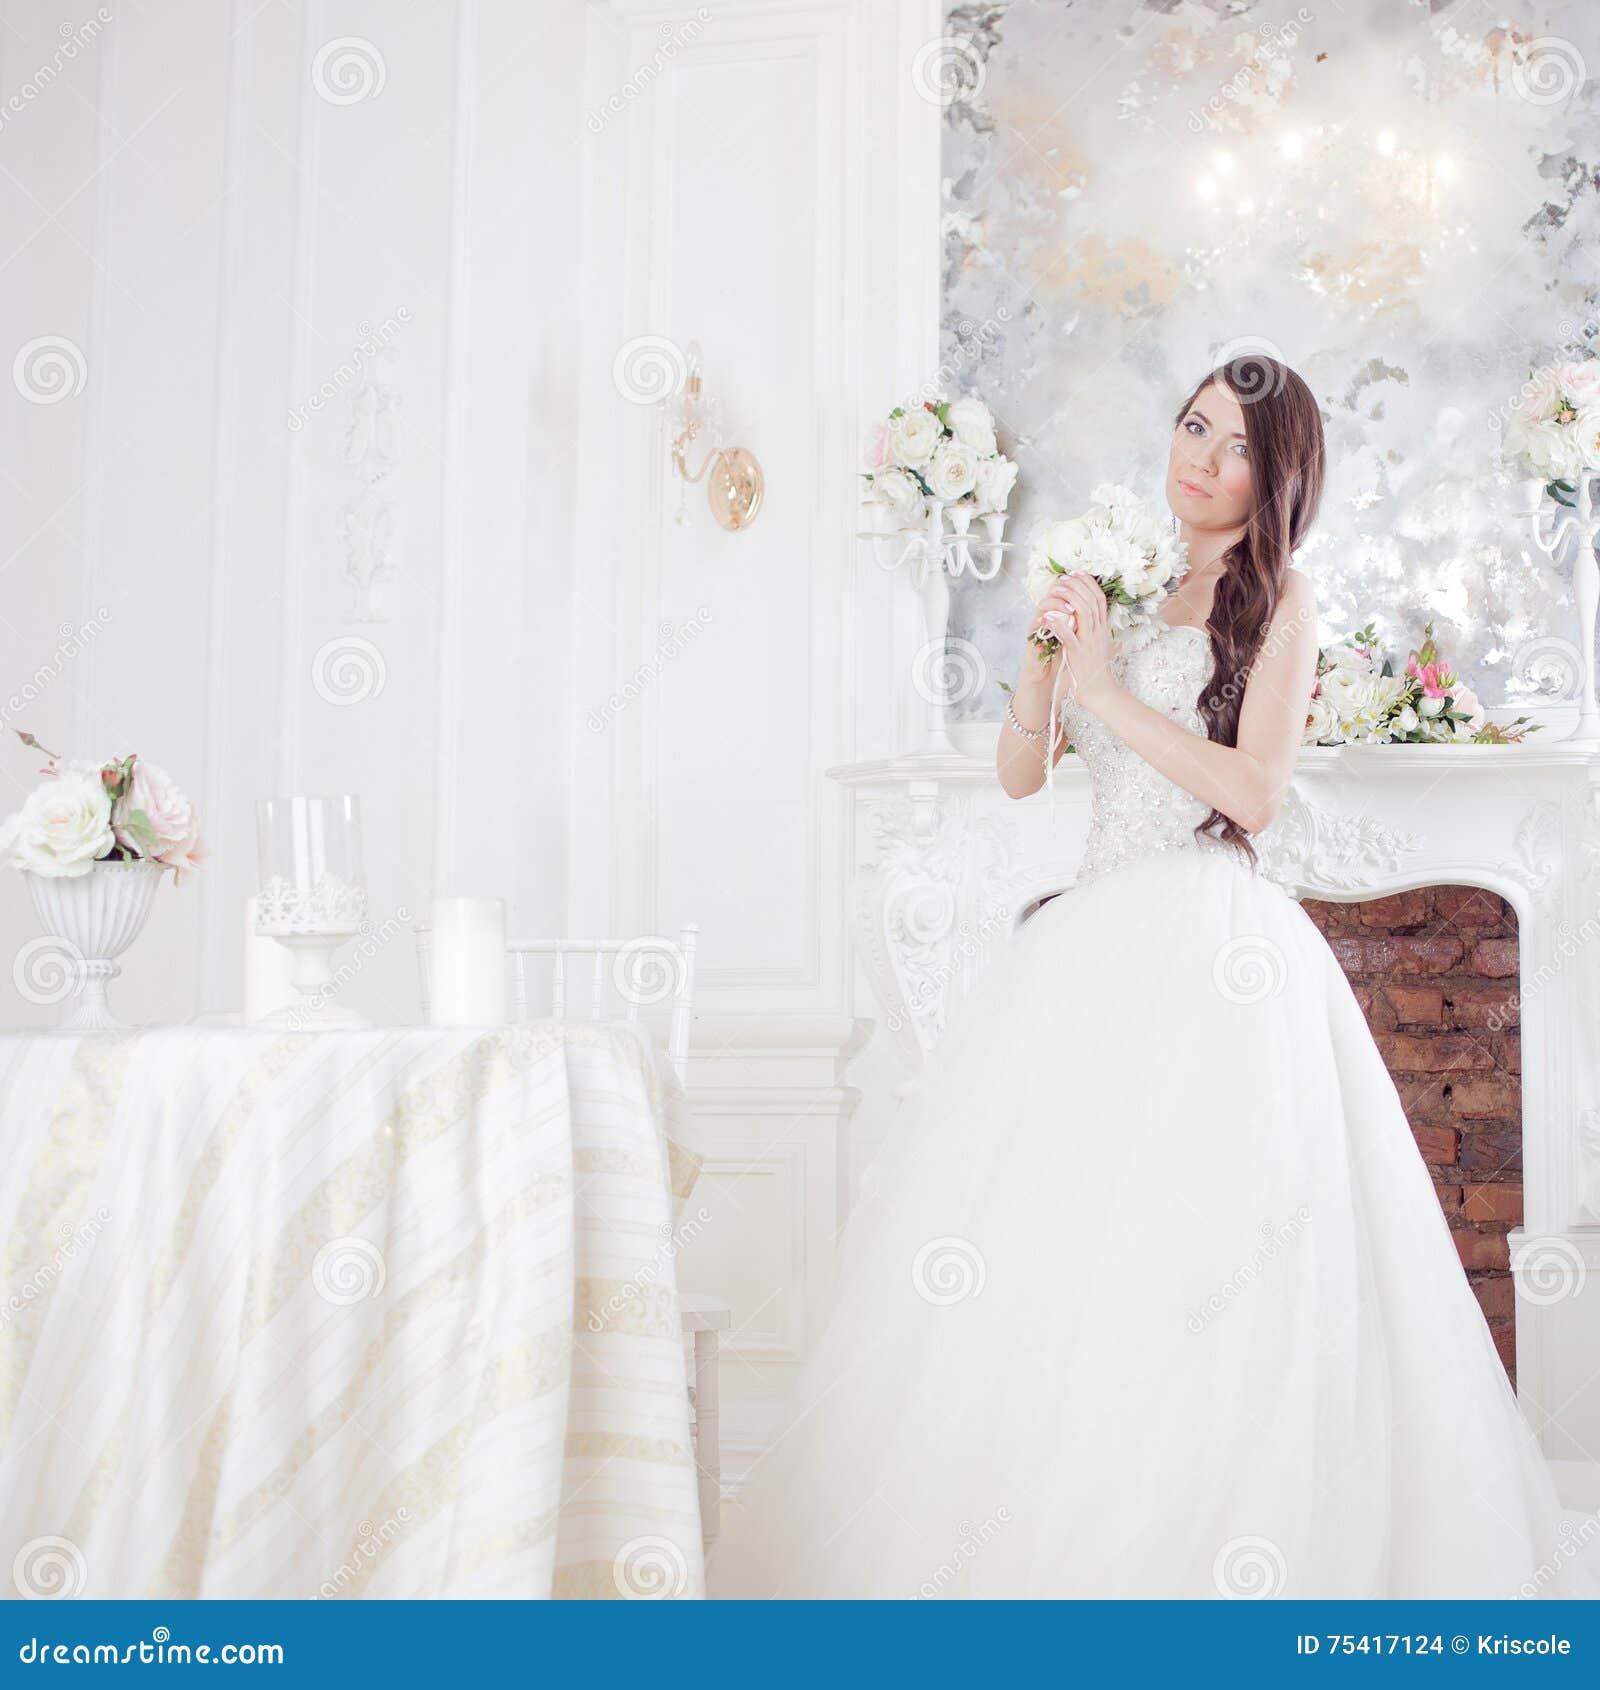 Portrait beautiful bride with a bouquet of flowers. Wedding decoration